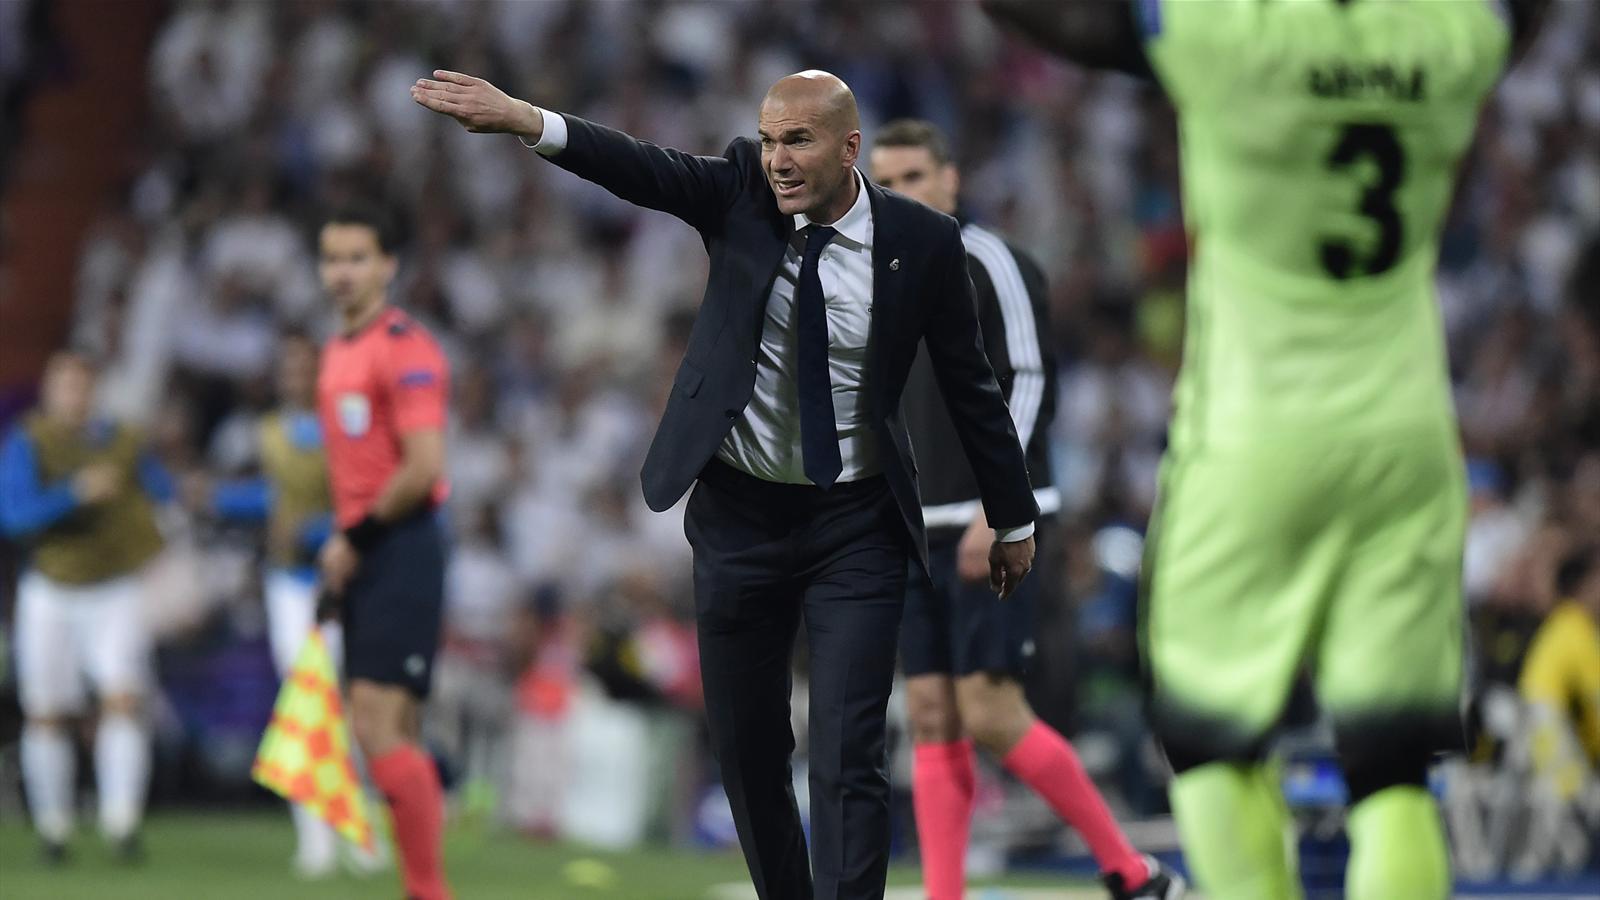 Miracle-worker Zinedine Zidane finally looks like a Real Madrid manager - Liga 2014-2015 - Football - Eurosport Australia